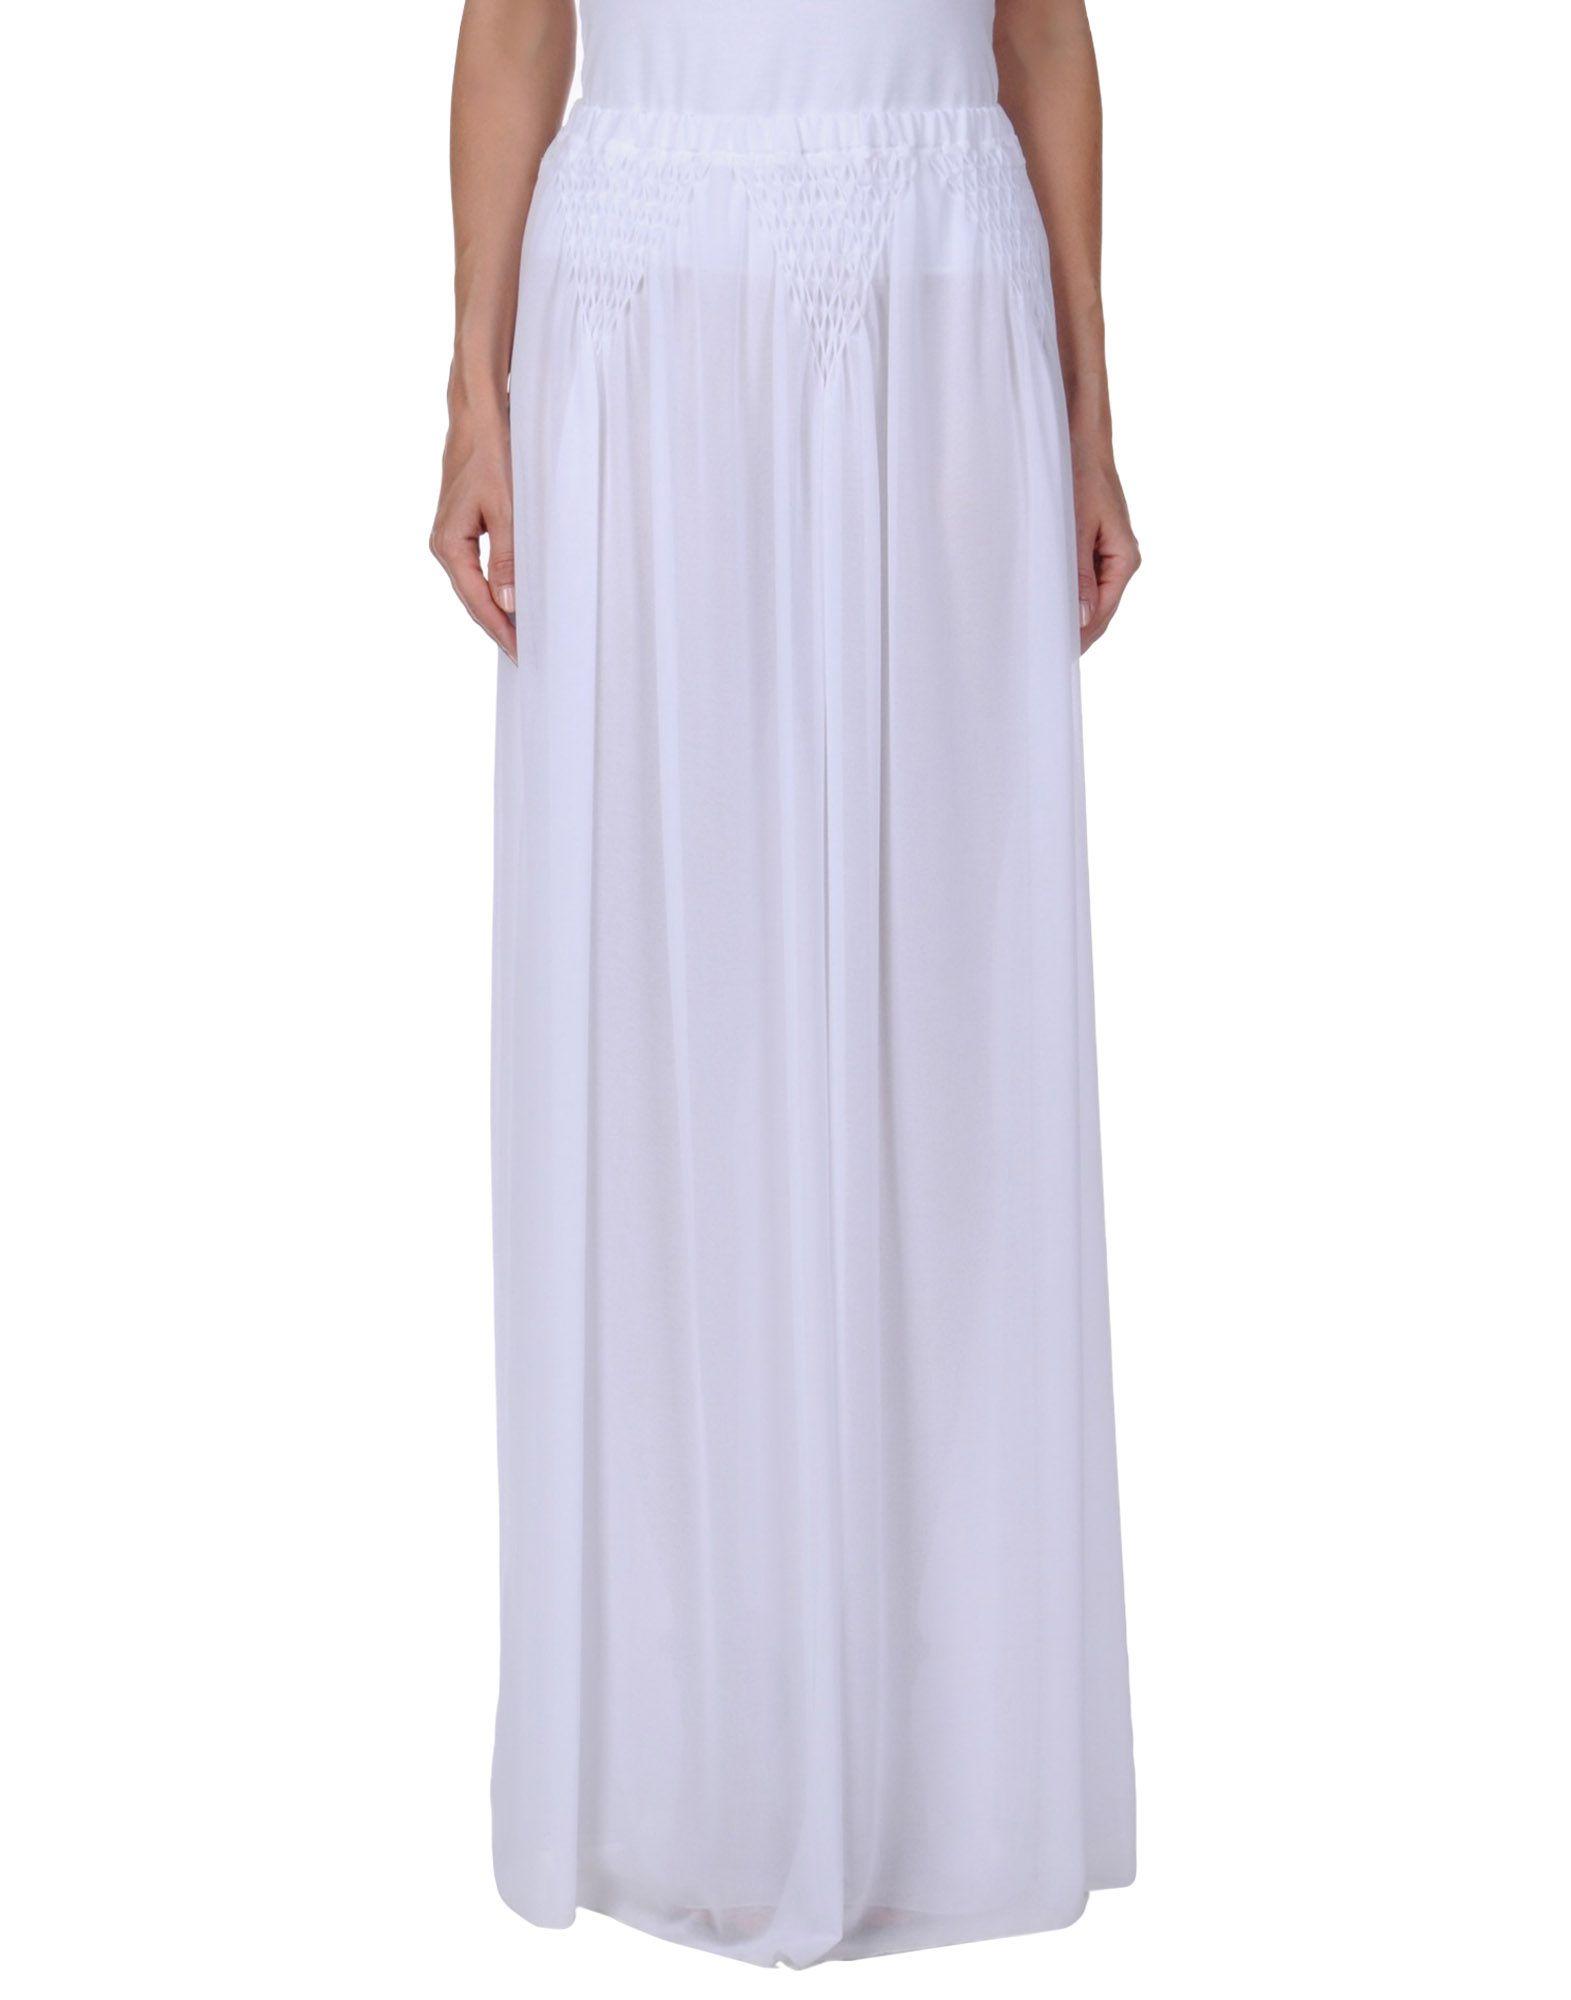 BLUGIRL BLUMARINE Длинная юбка юбка длинная с кружевом blumarine юбка длинная с кружевом